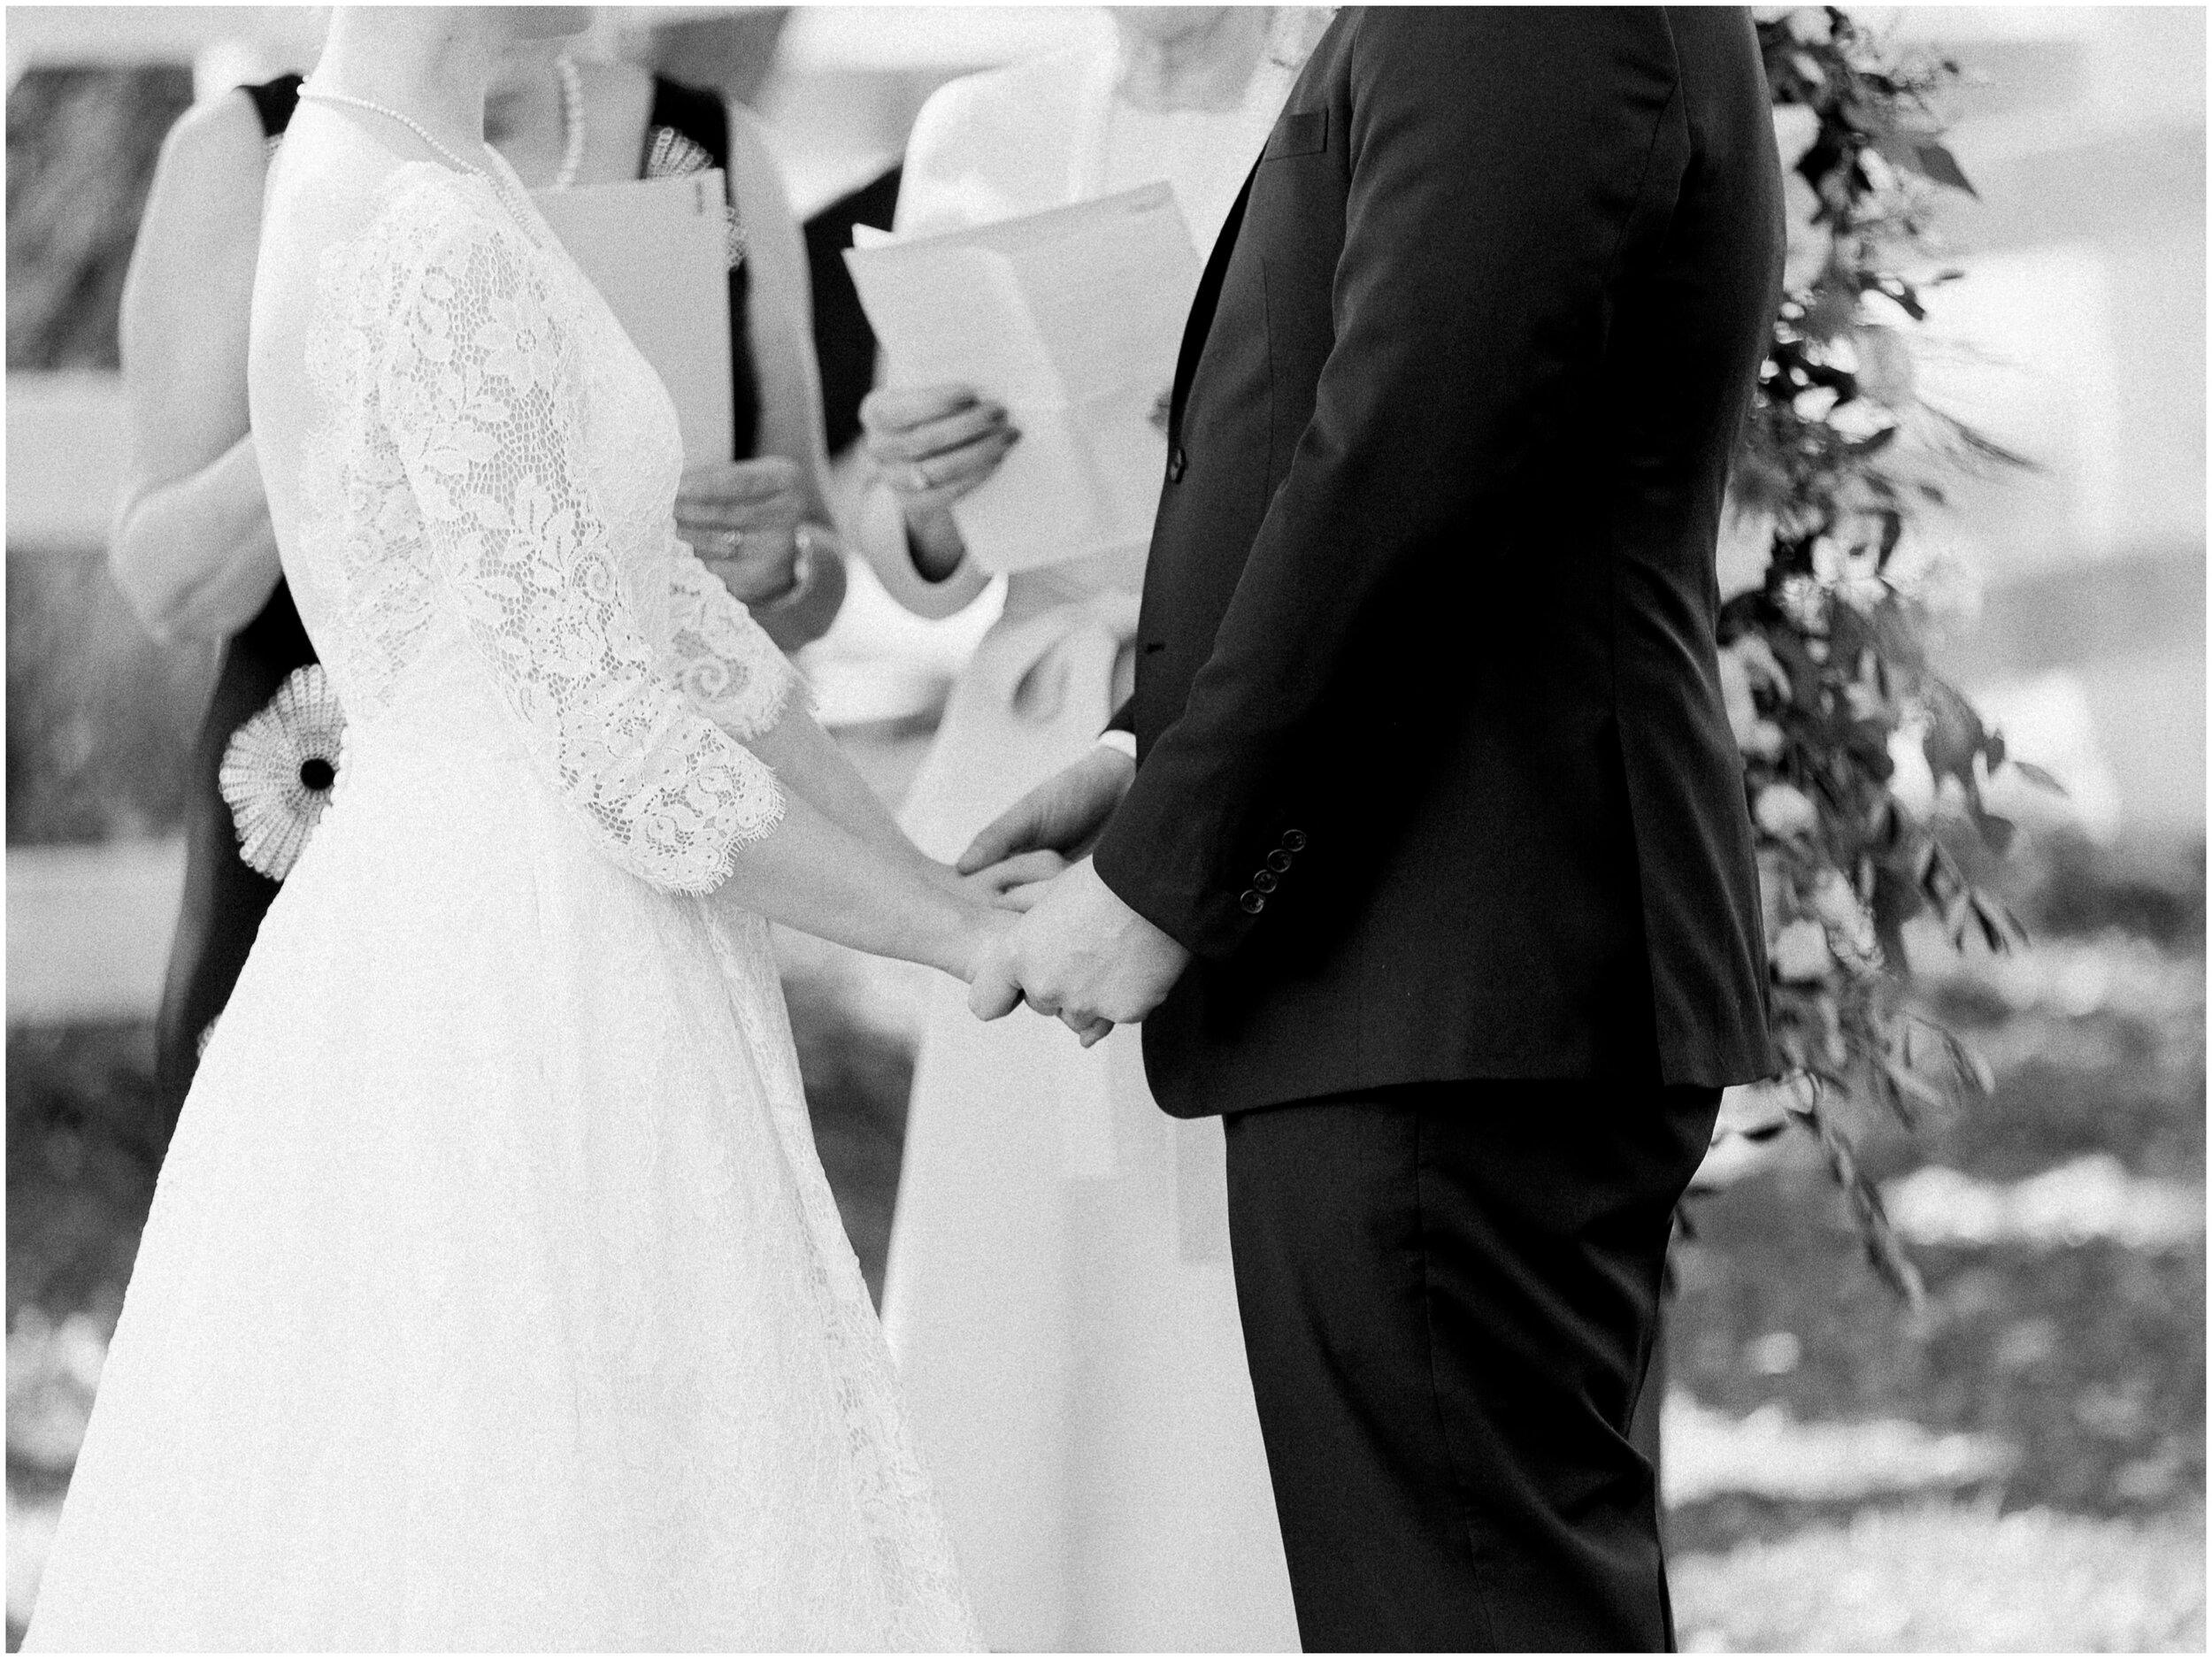 brisbane-film-wedding-photographer-lauren-olivia-luxury-wedding-australia-01-07.jpg